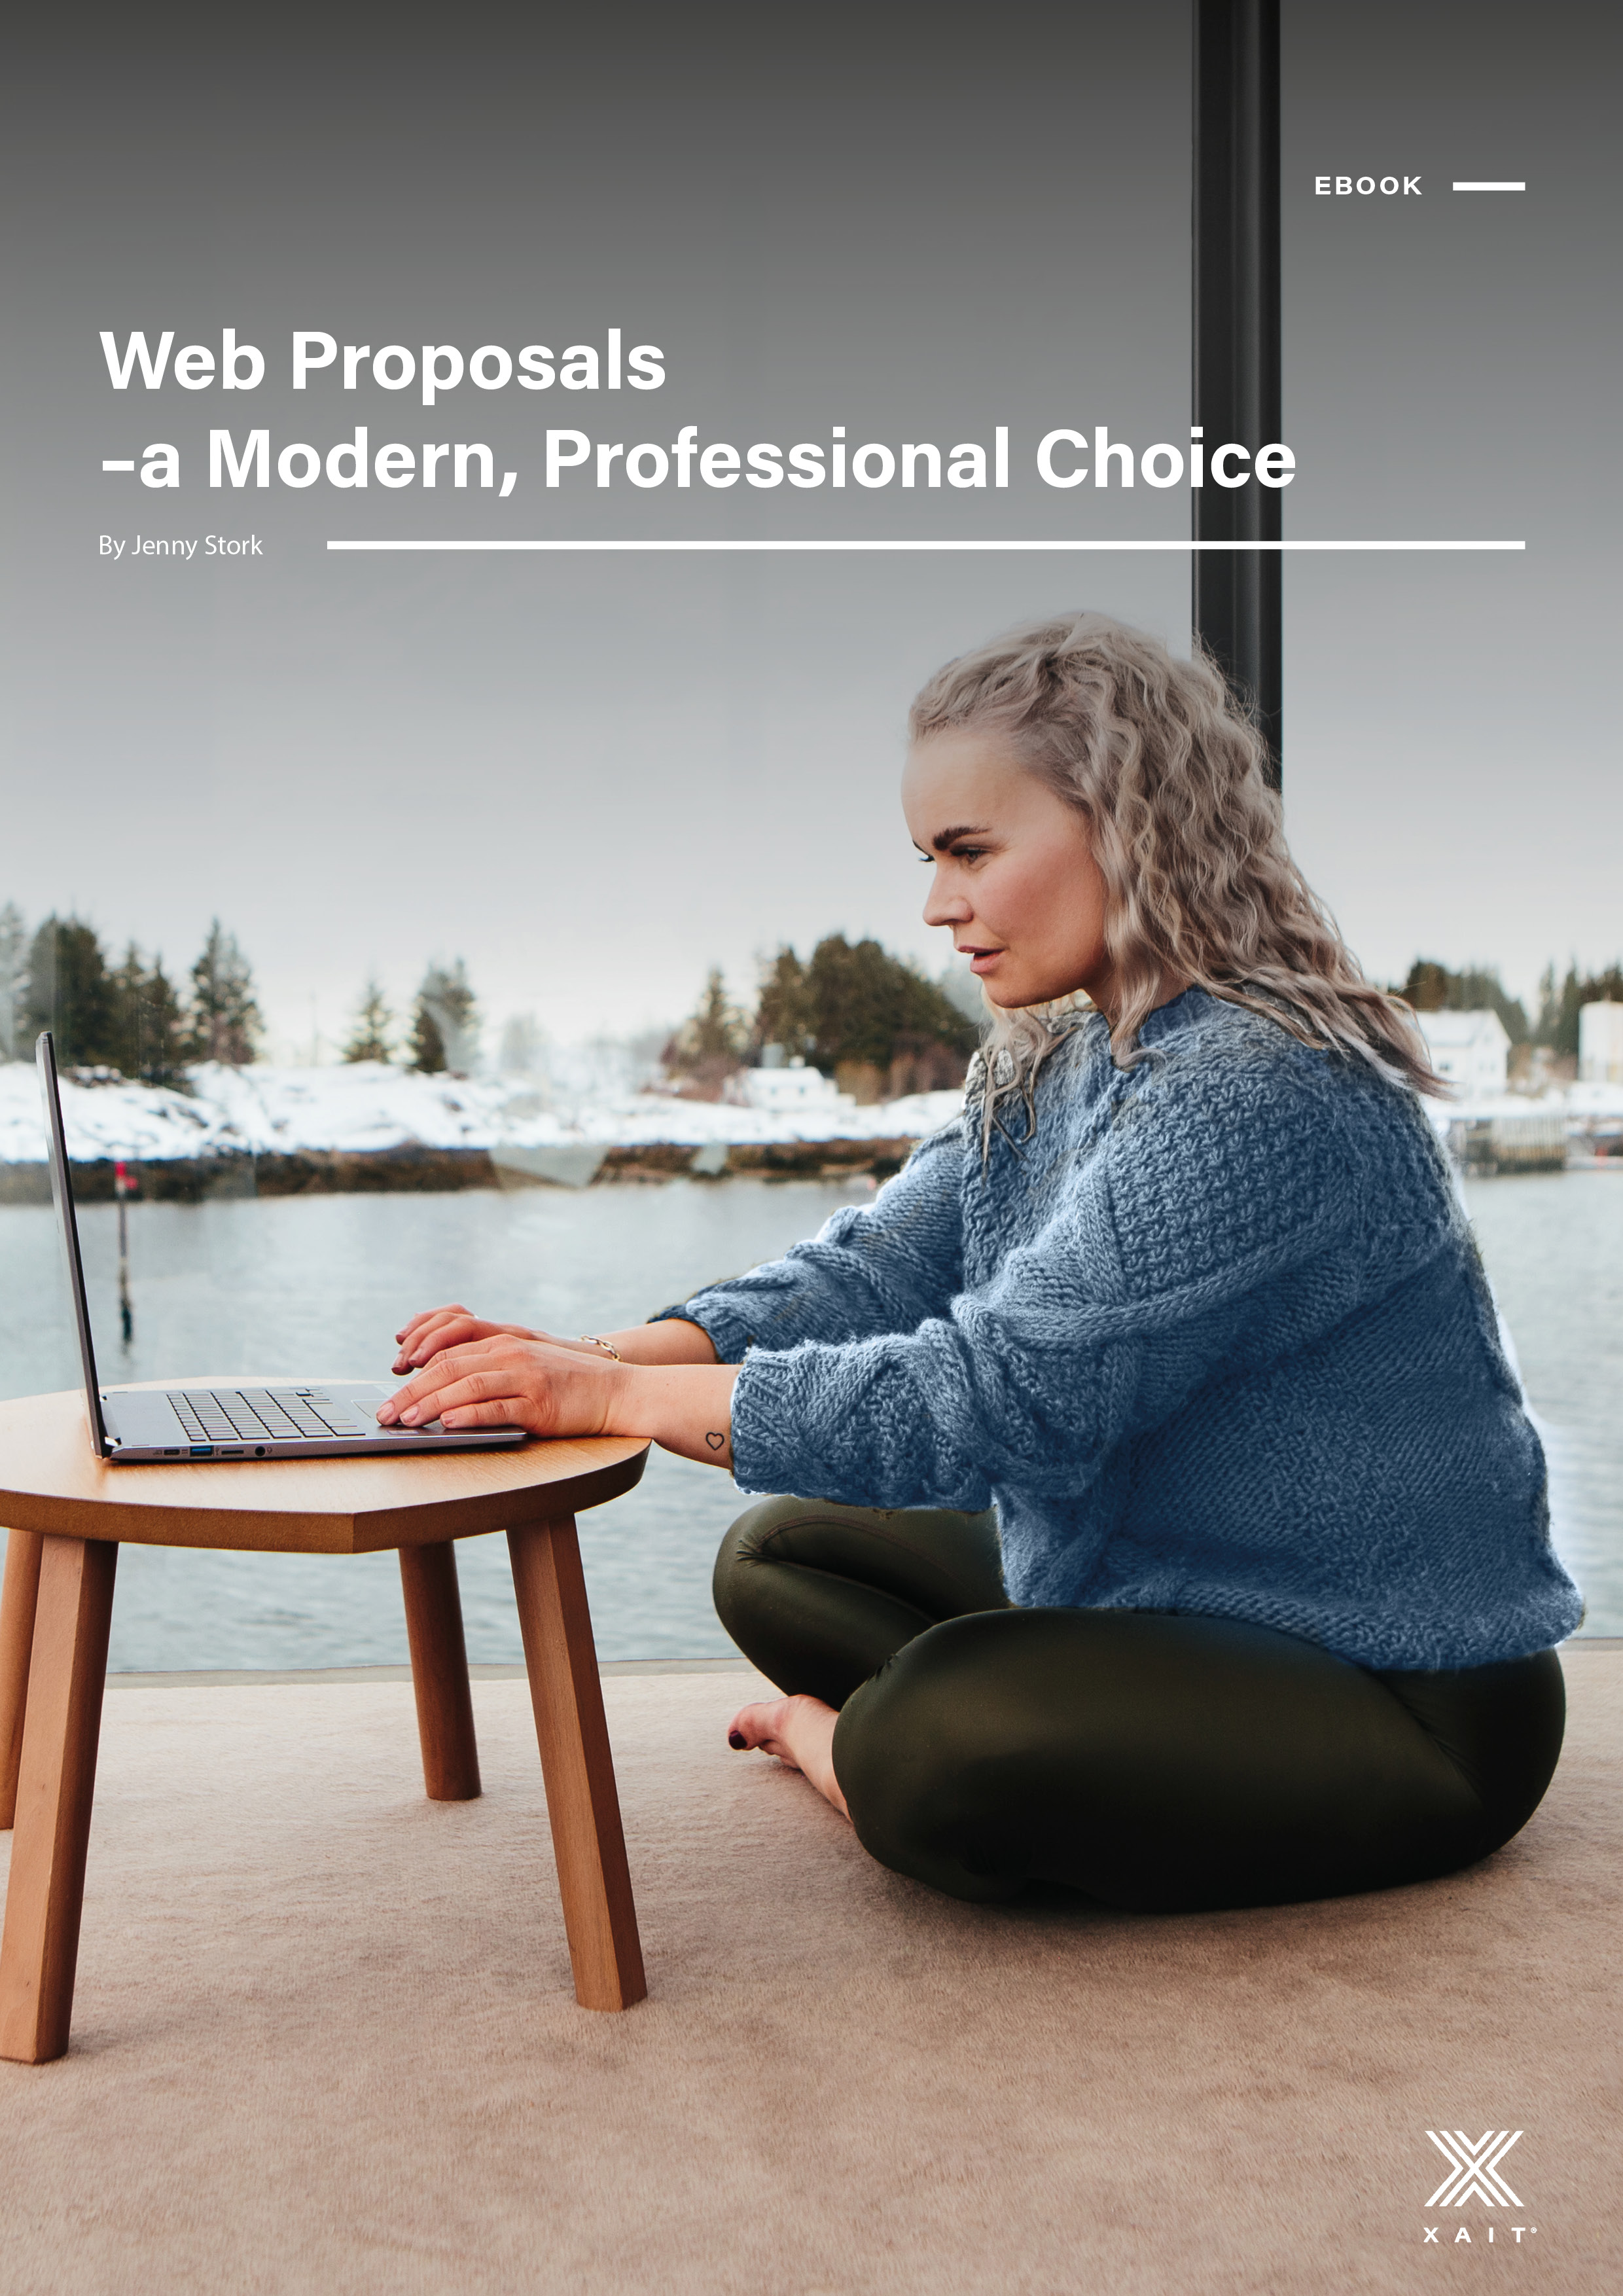 XaitCPQ Web Proposals eBook